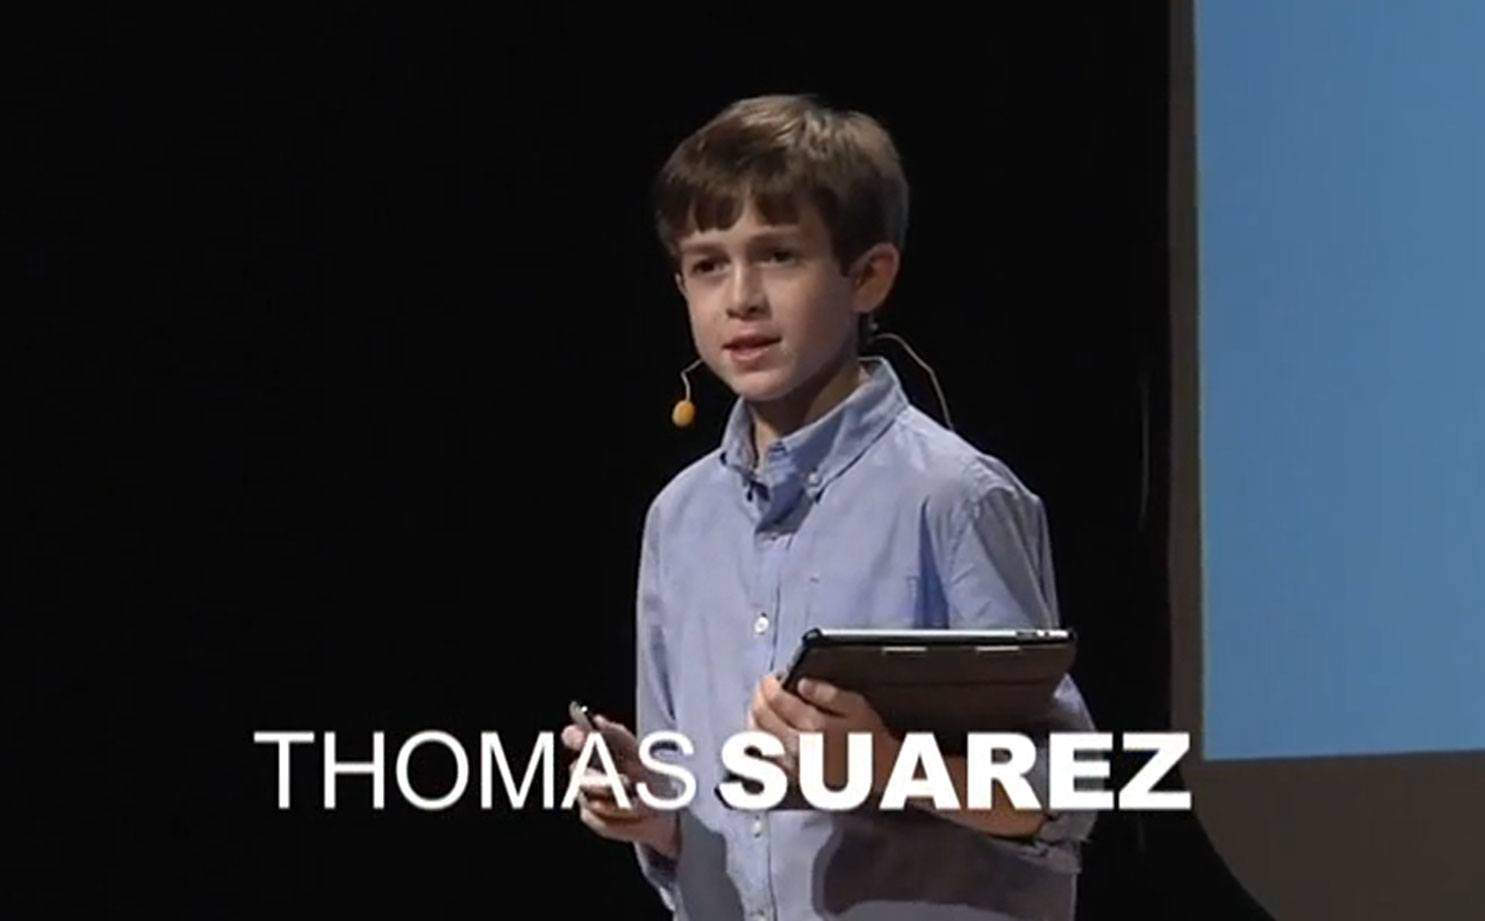 توماس سواريز